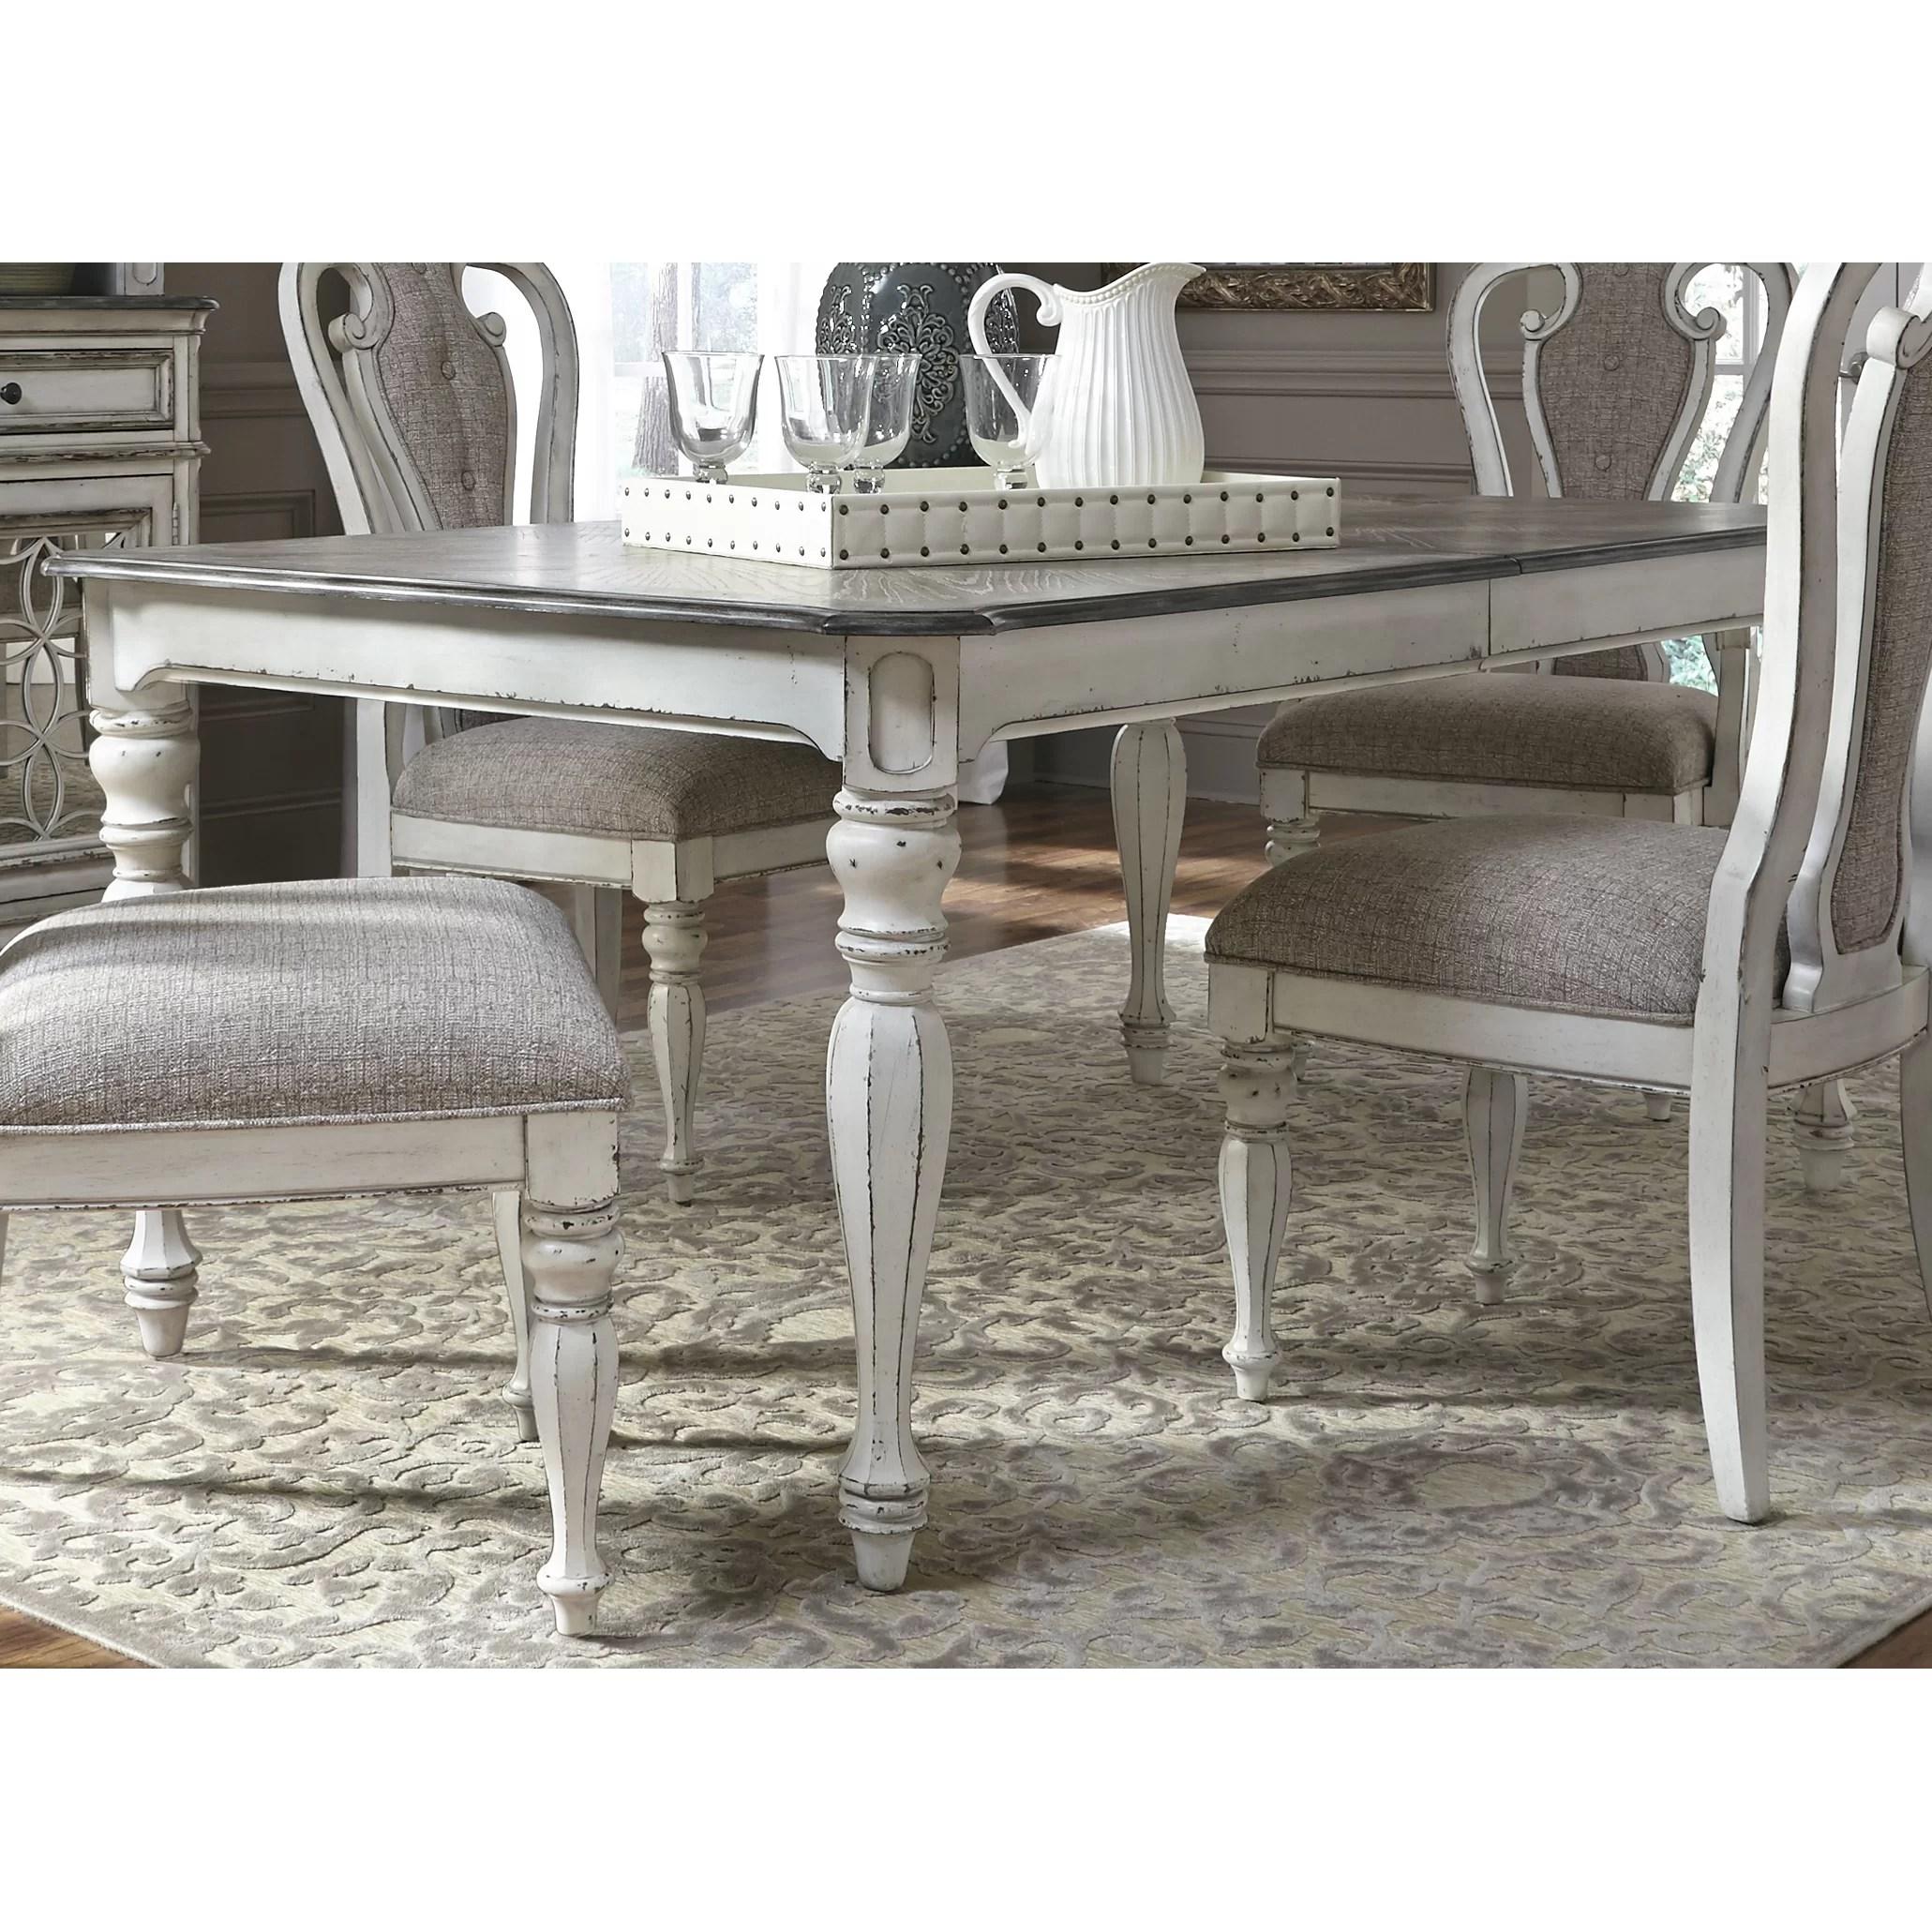 One Allium Way C2 AE Colette Extendable Dining Table OAWY gray kitchen table One Allium Way reg Colette Extendable Dining Table